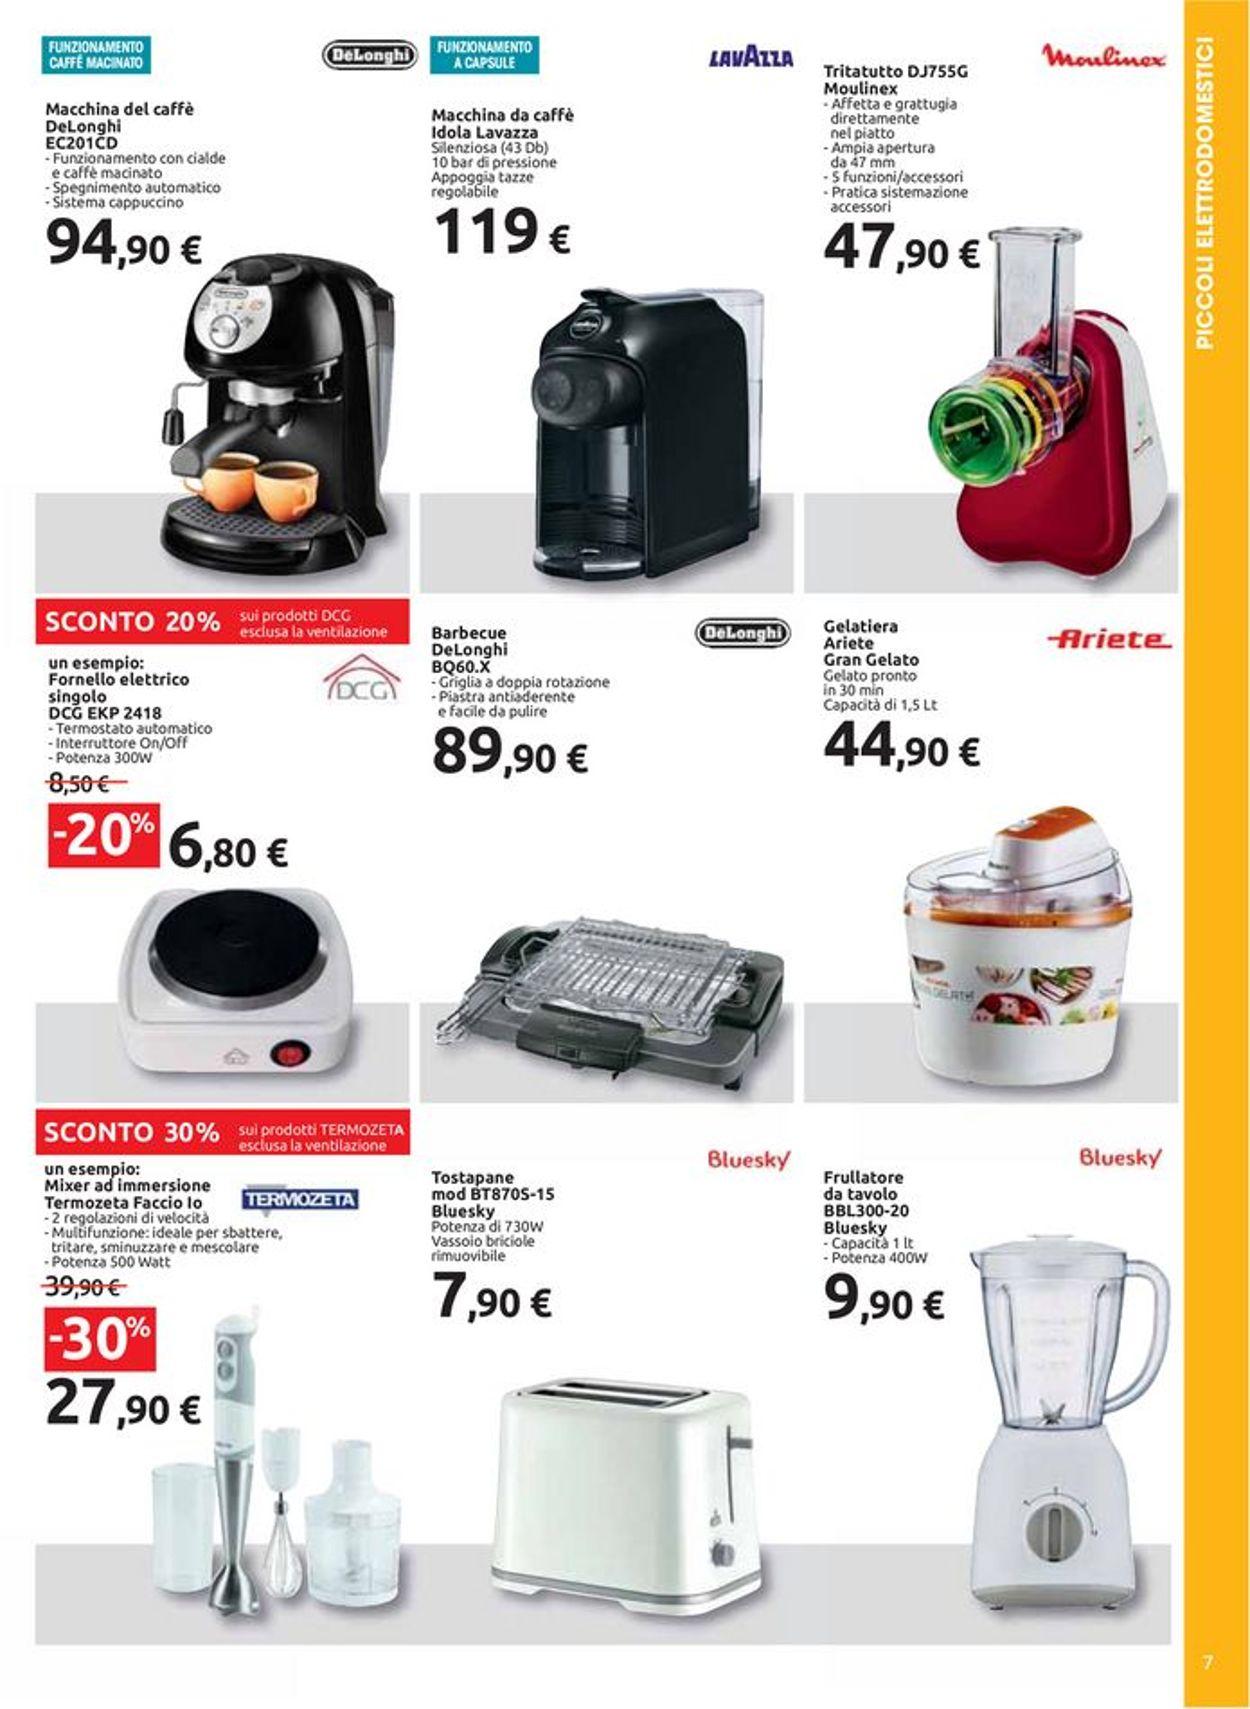 Volantino Carrefour - Offerte 31/05-01/08/2021 (Pagina 7)